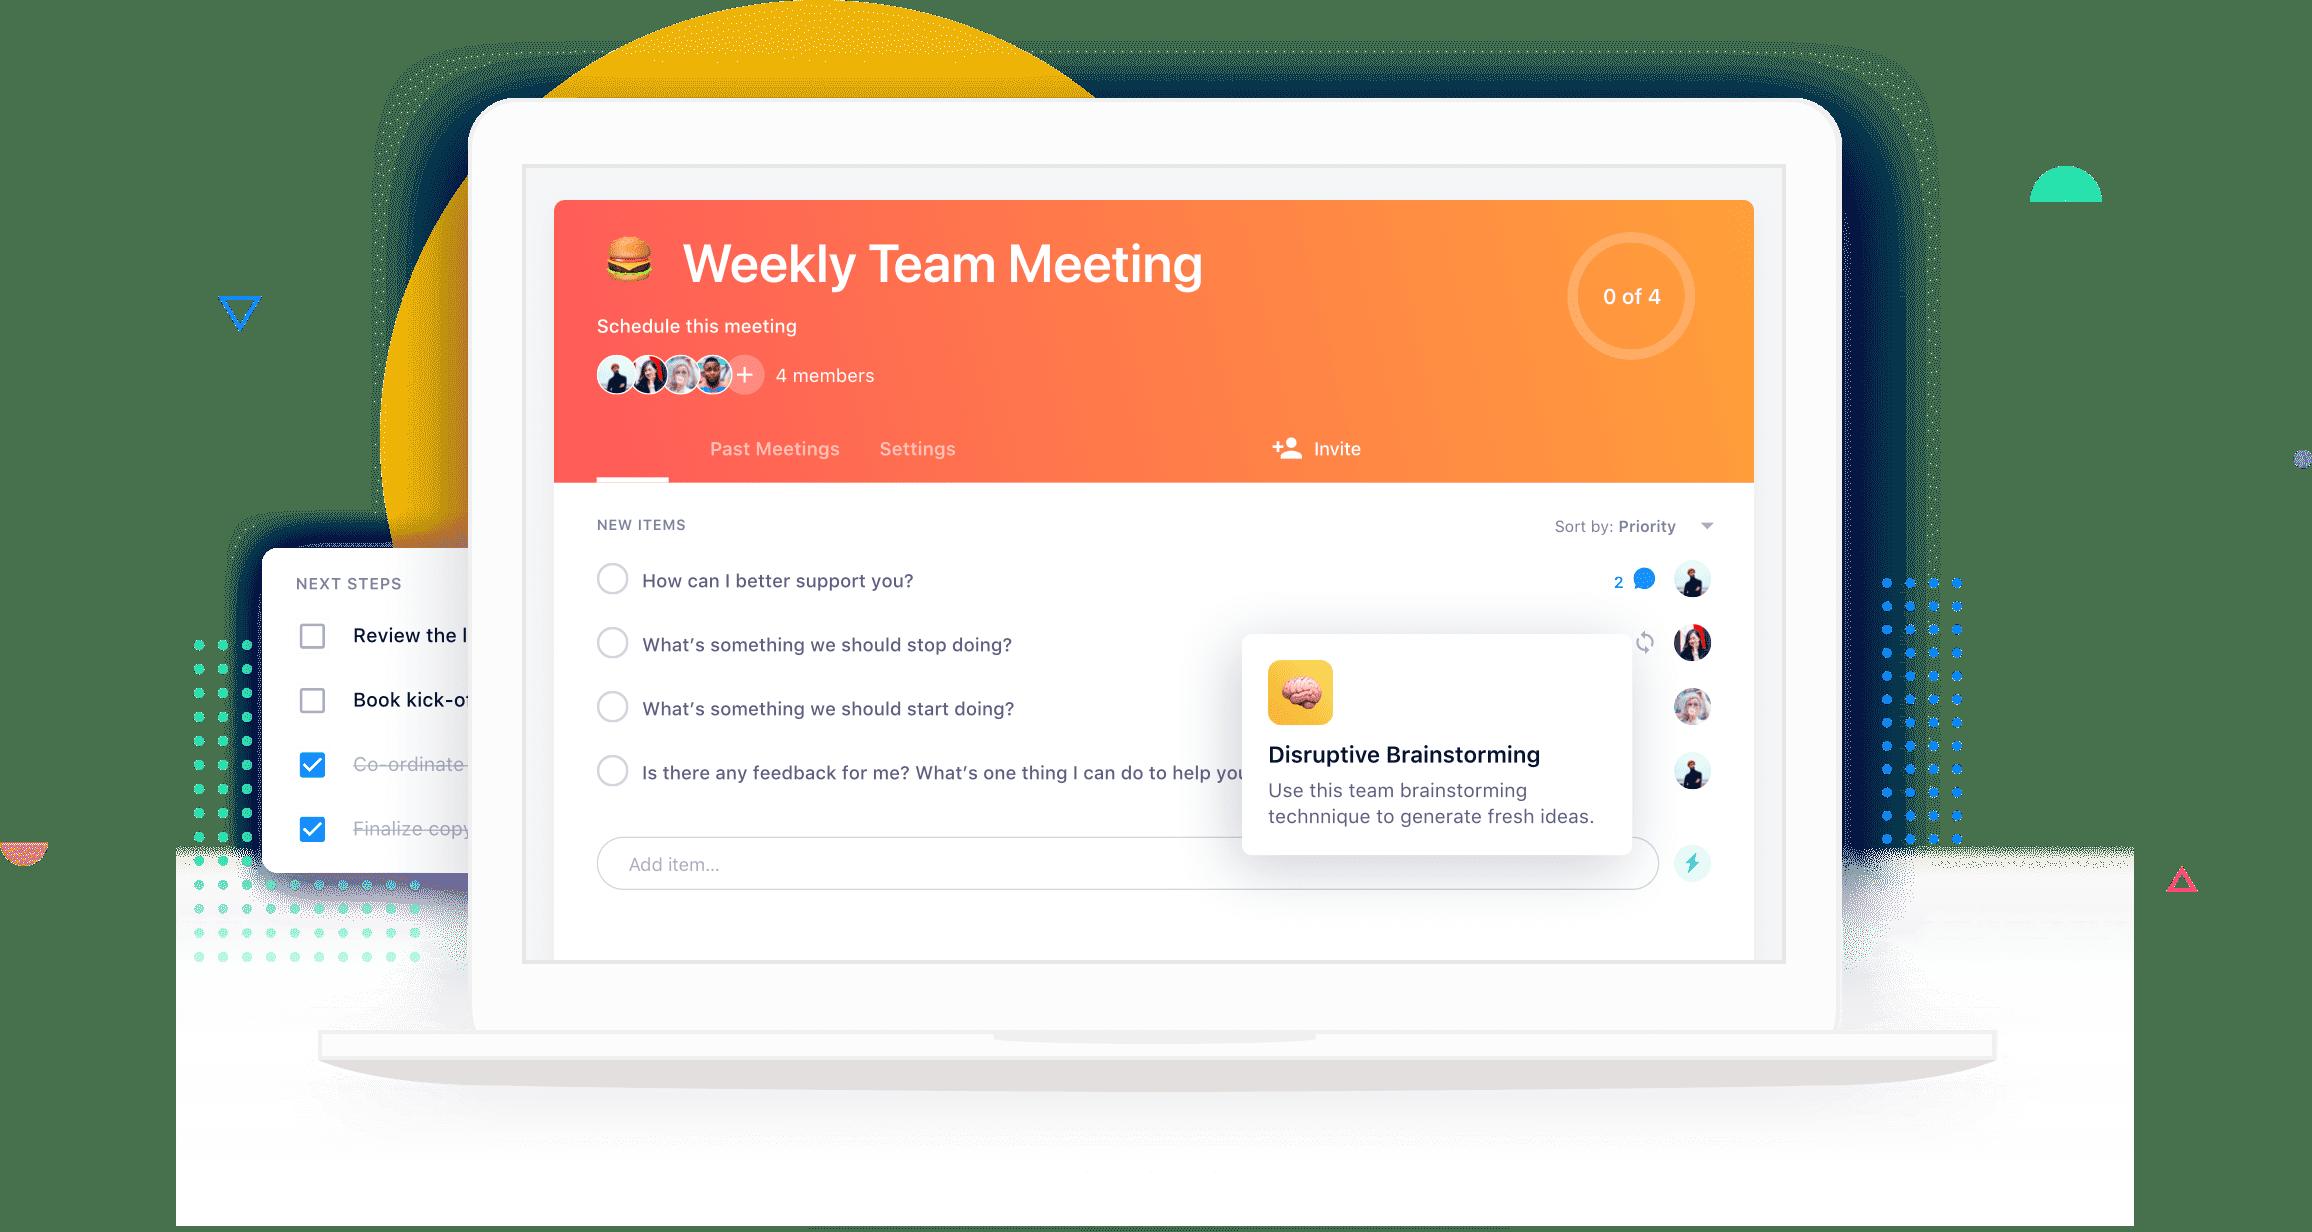 Shared online meeting agenda in Soapbox